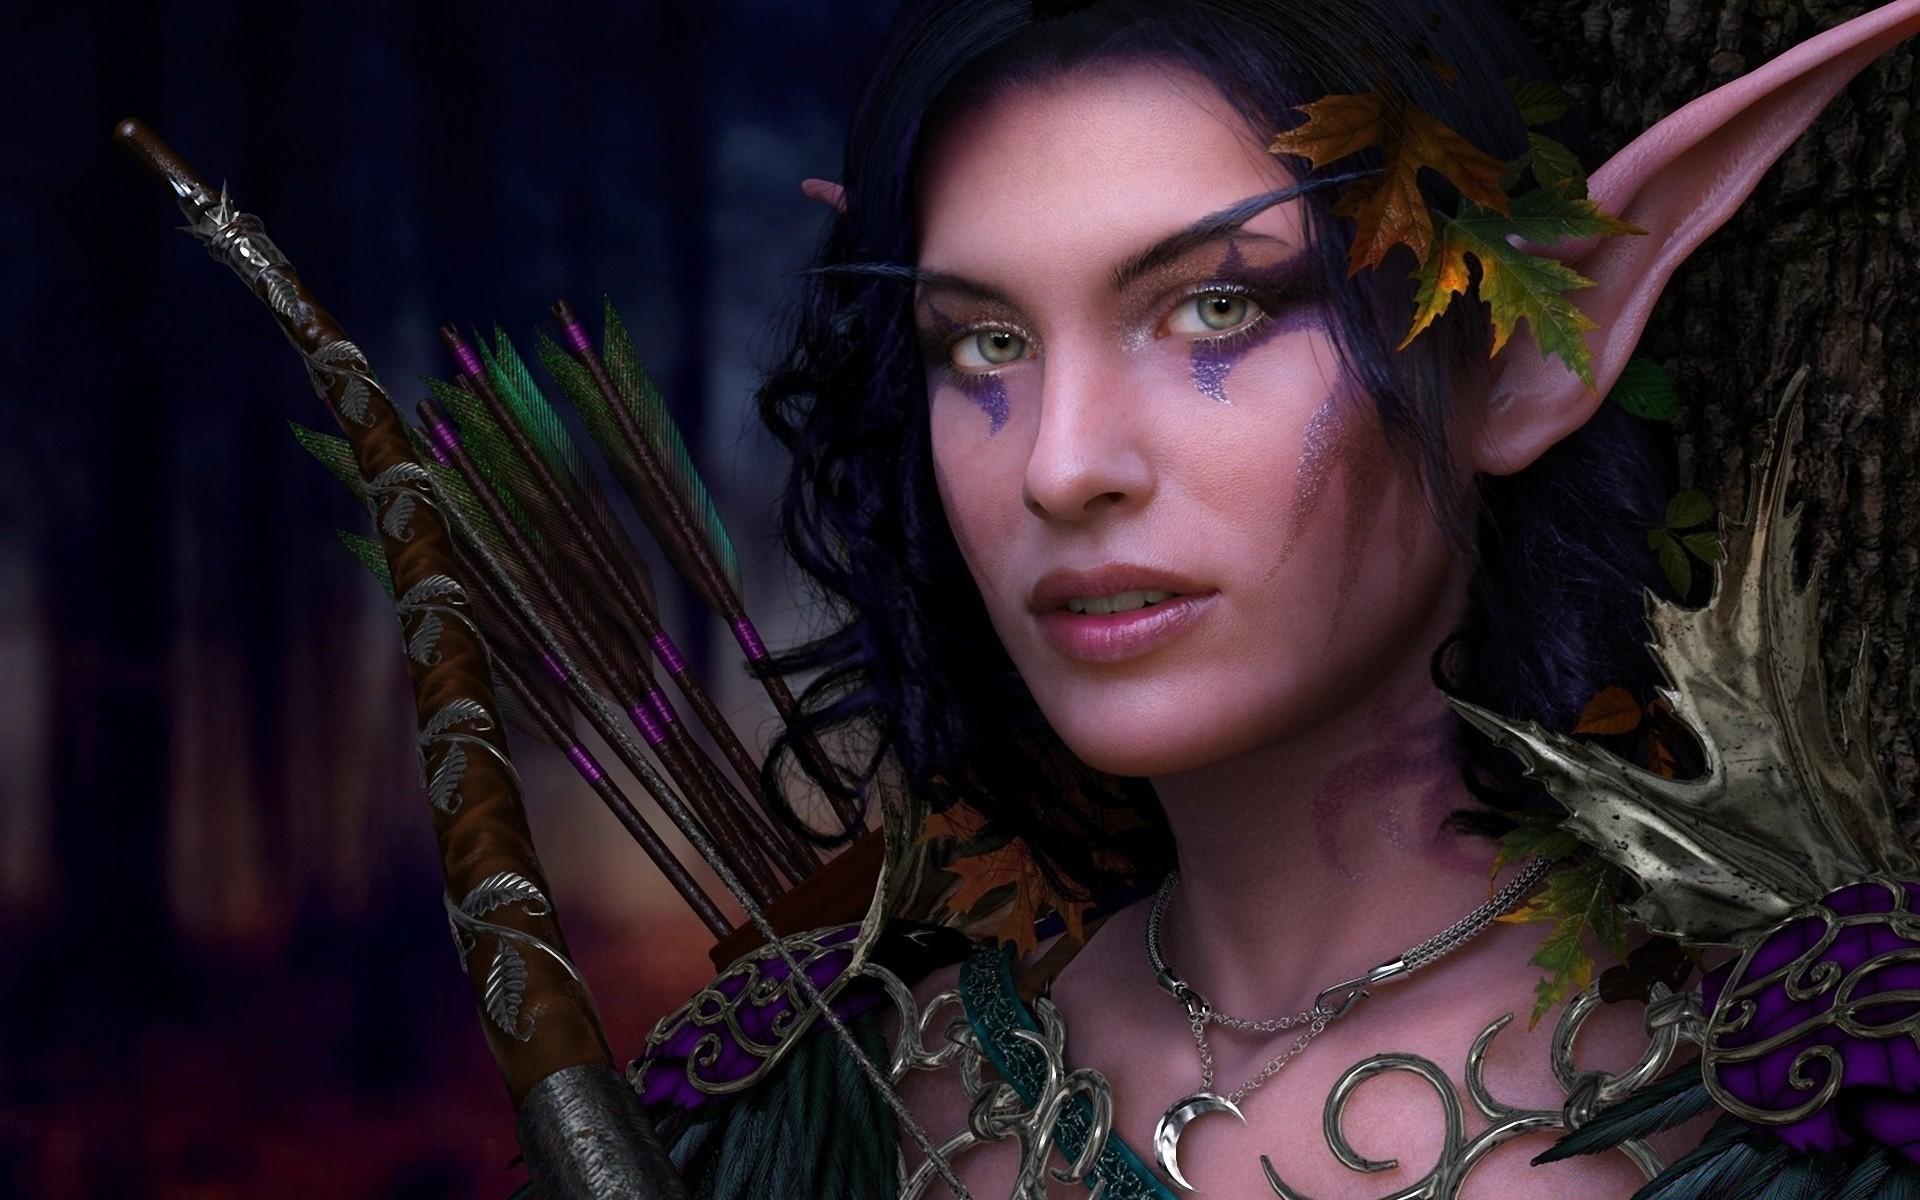 Elf woman sex movie